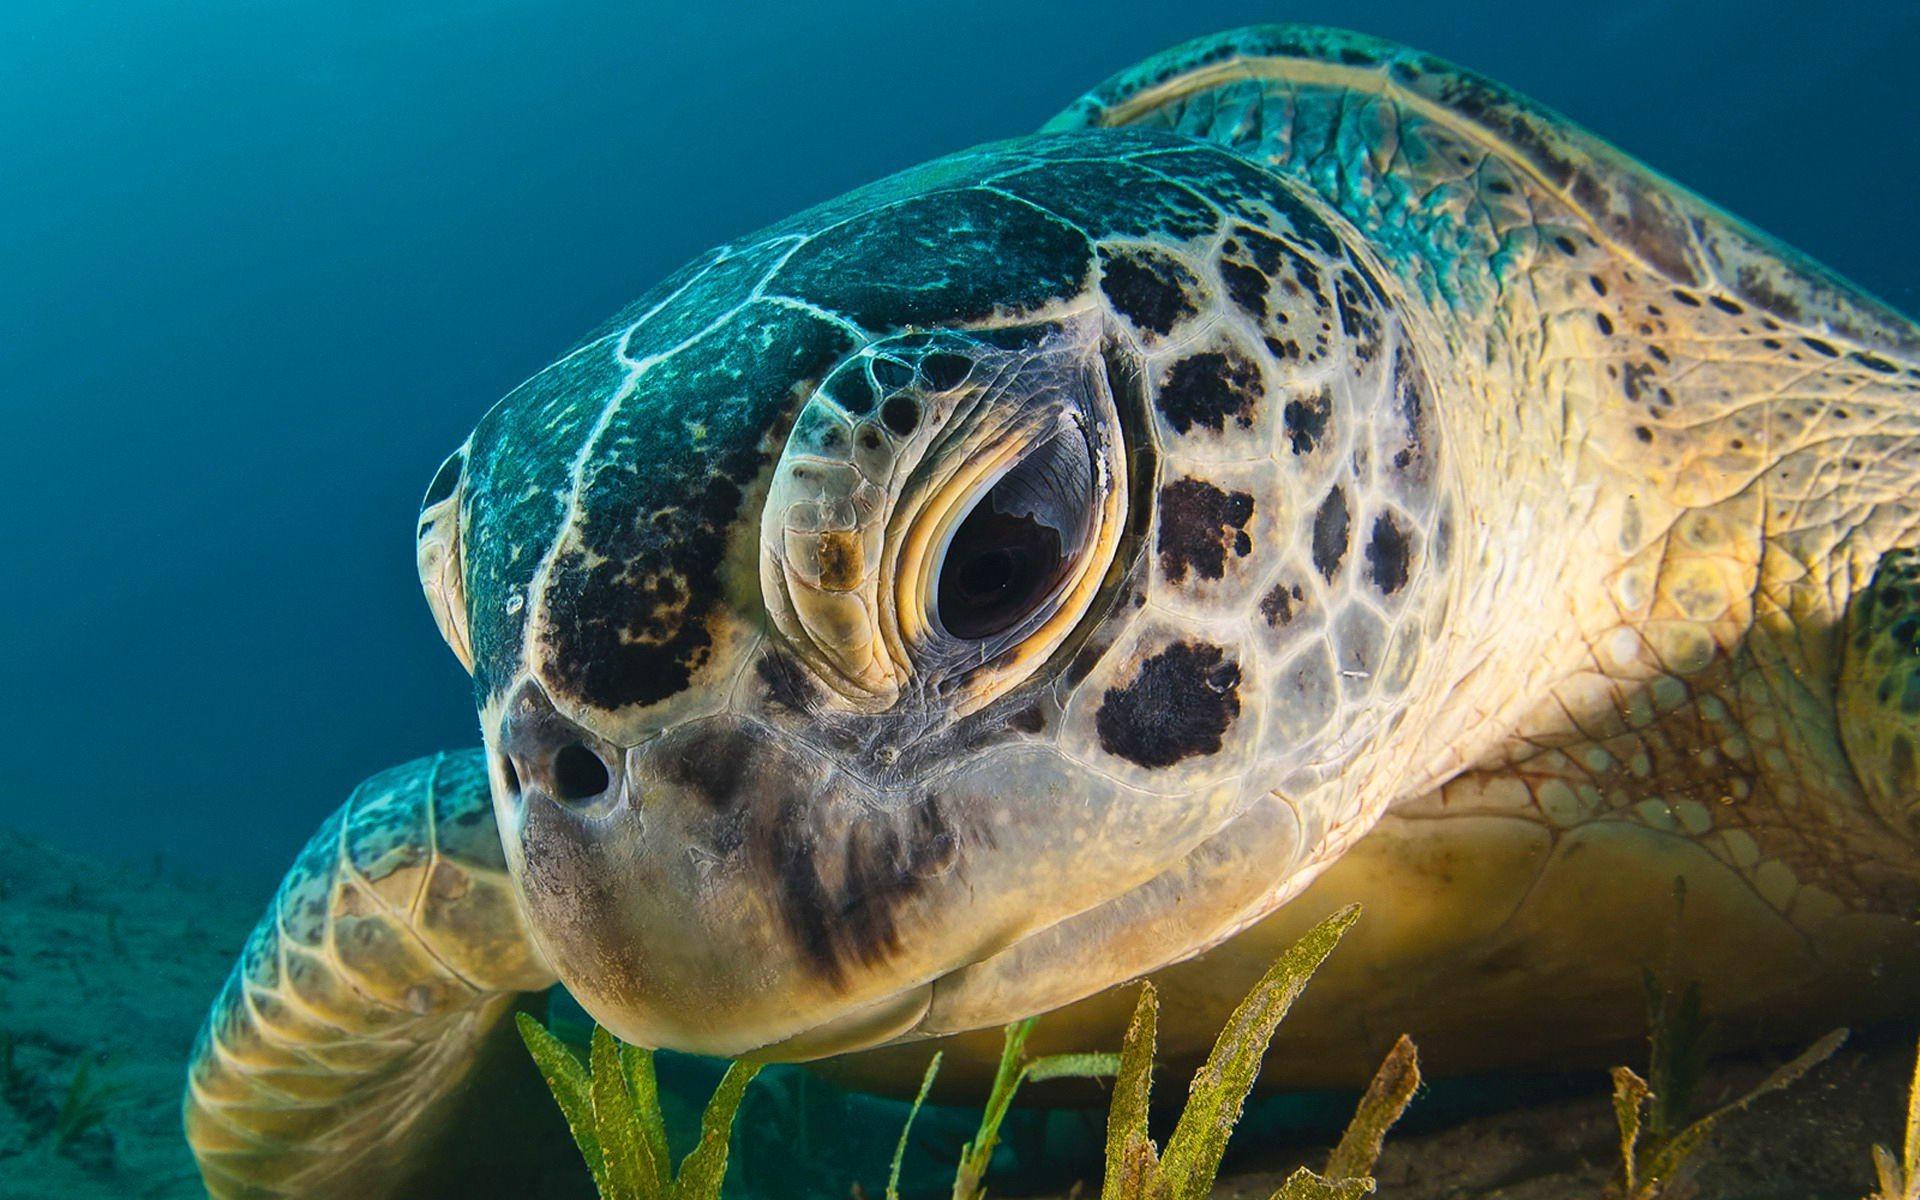 Sea Turtle Laptop Wallpapers